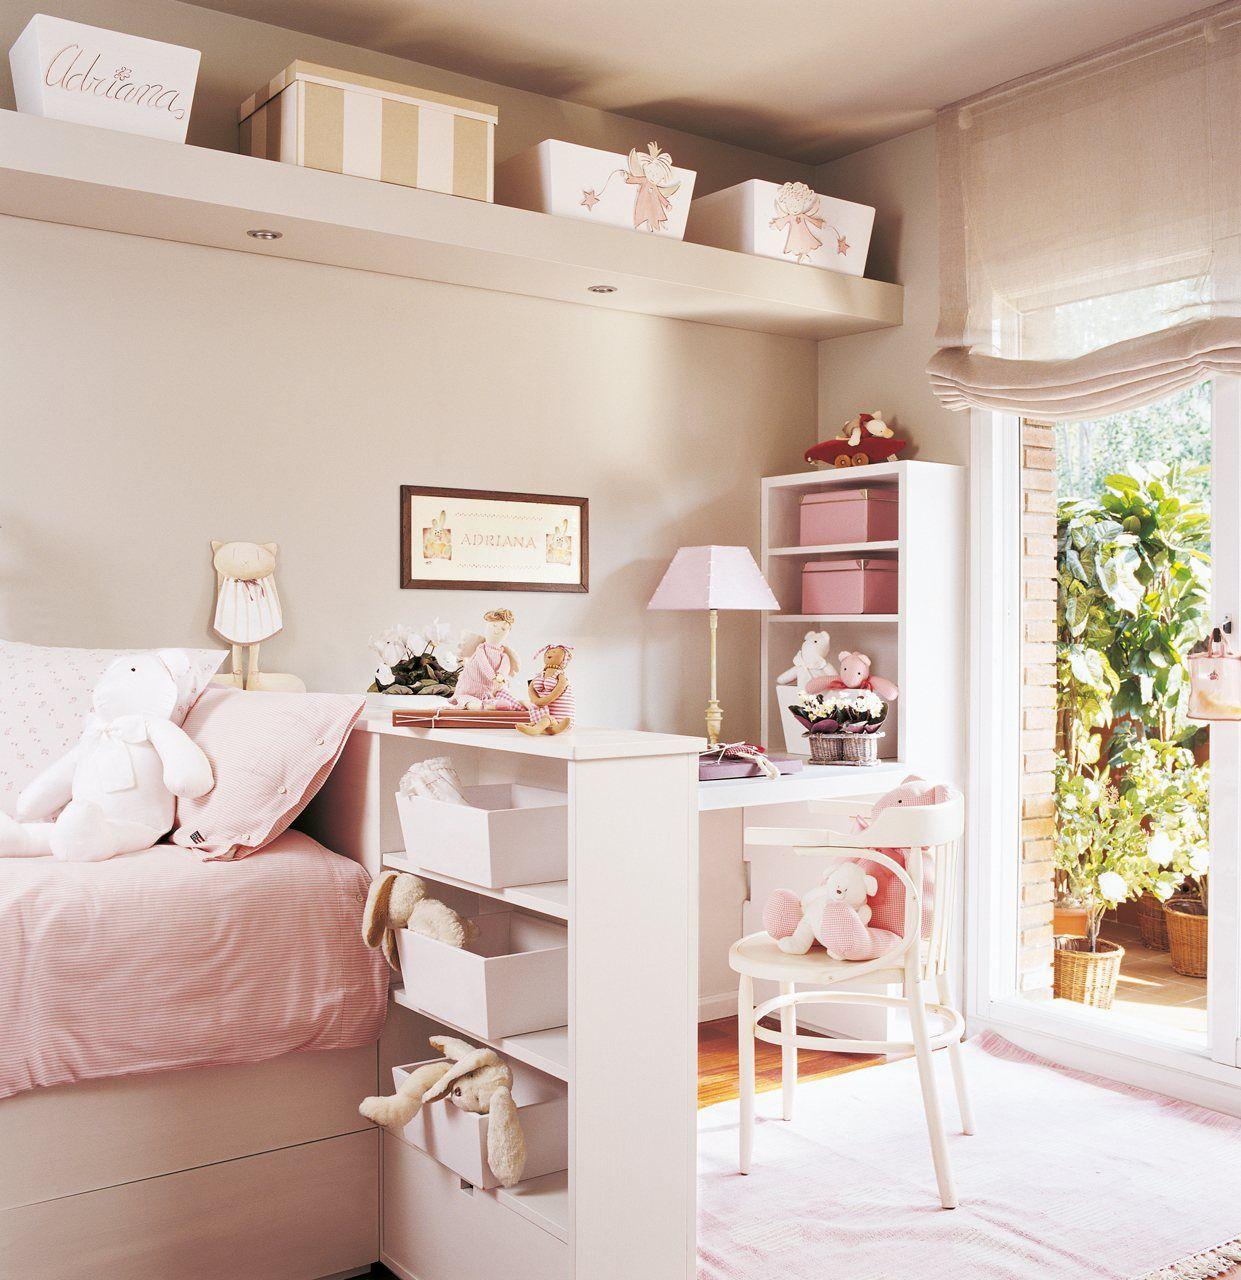 Dormitorios infantiles peque os s cales partido habitaciones para ni as pinterest - Dormitorios infantiles pequenos ...